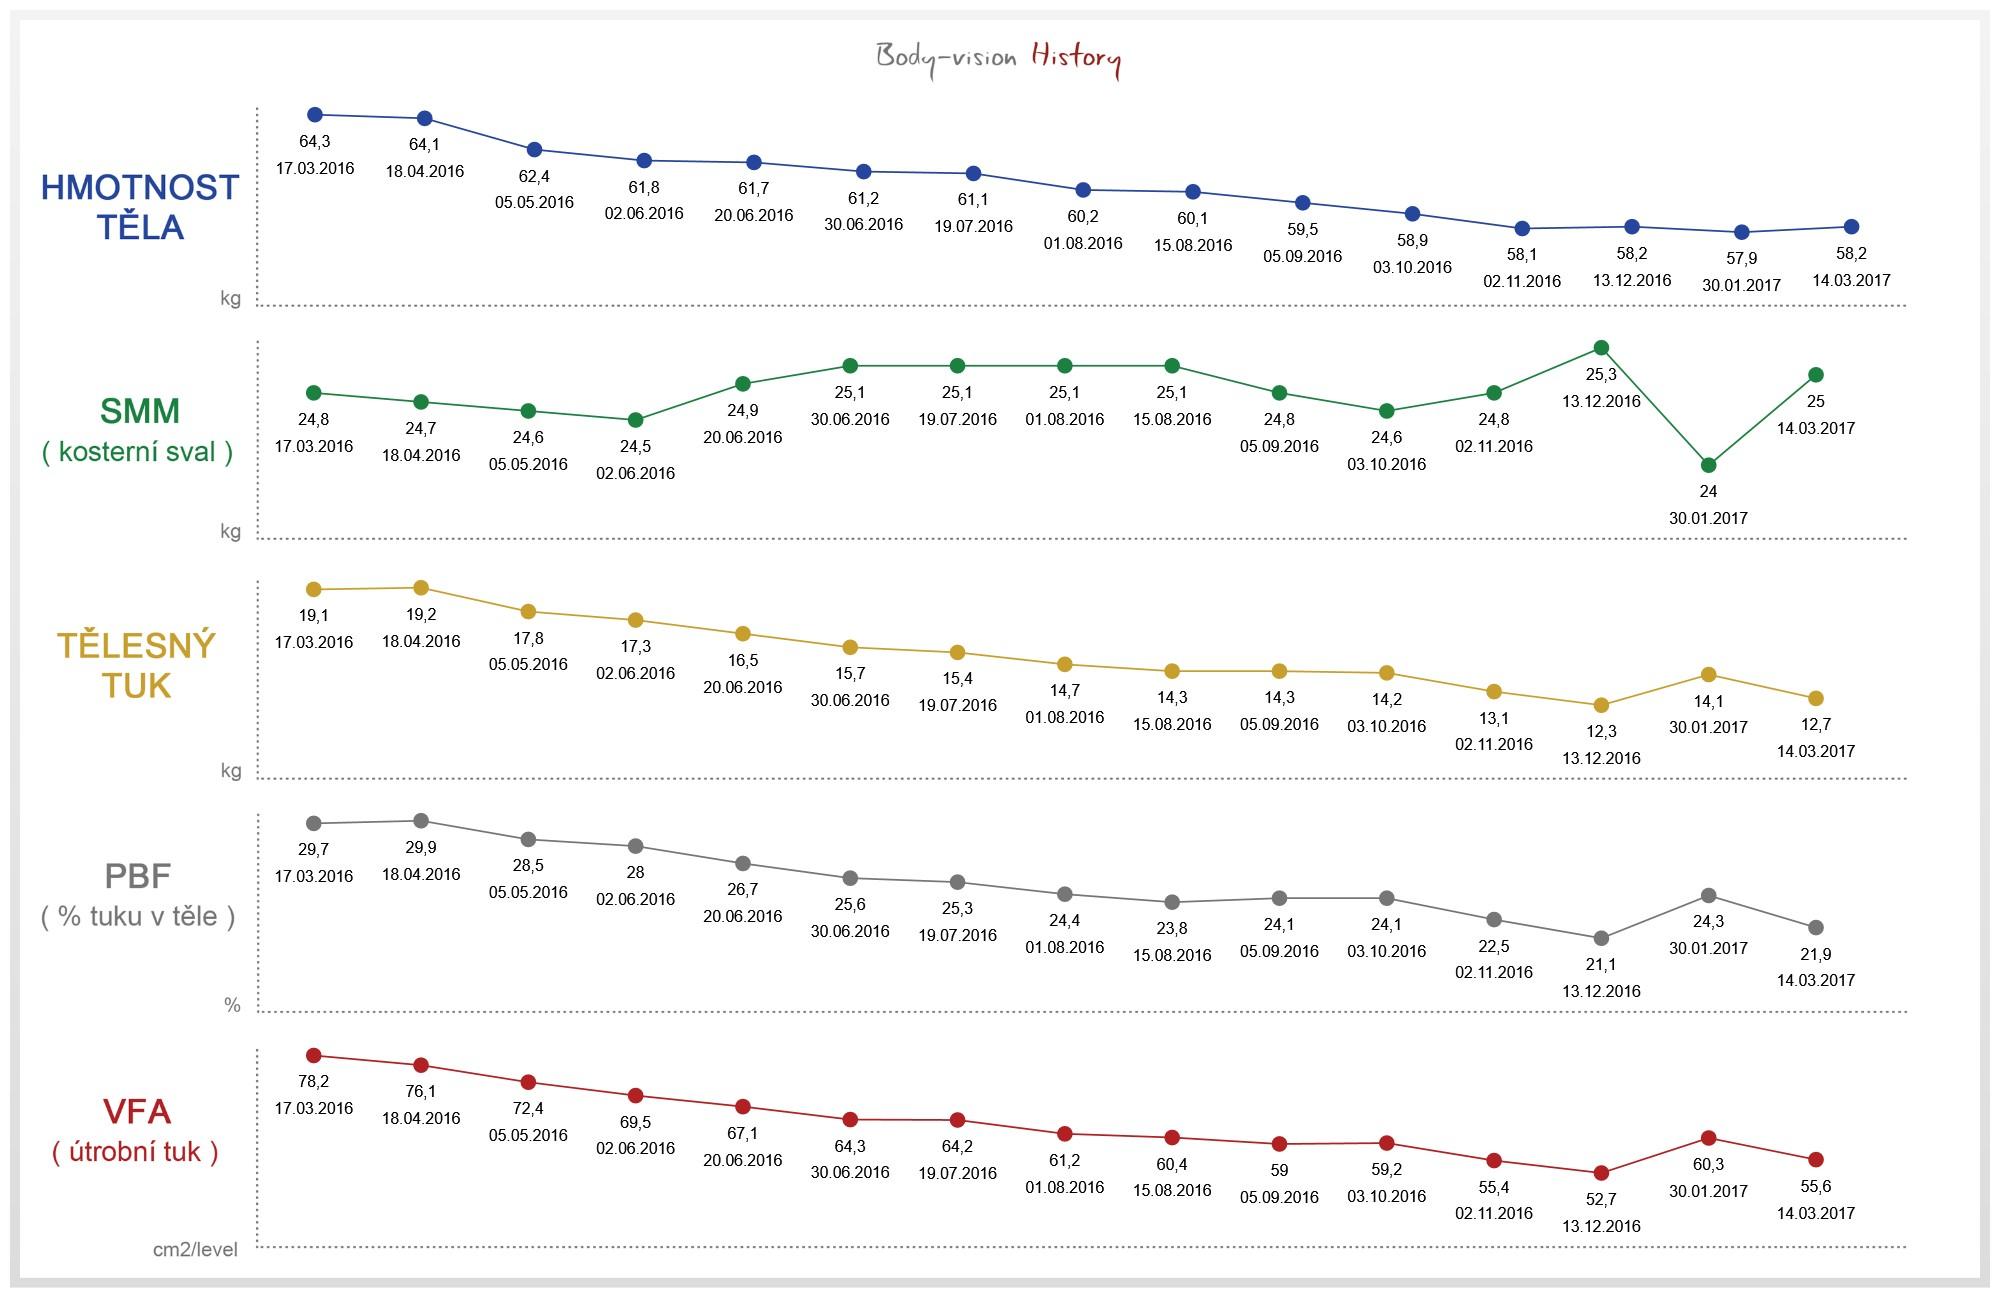 Statistiky_klientky_hubnuti_obrazek